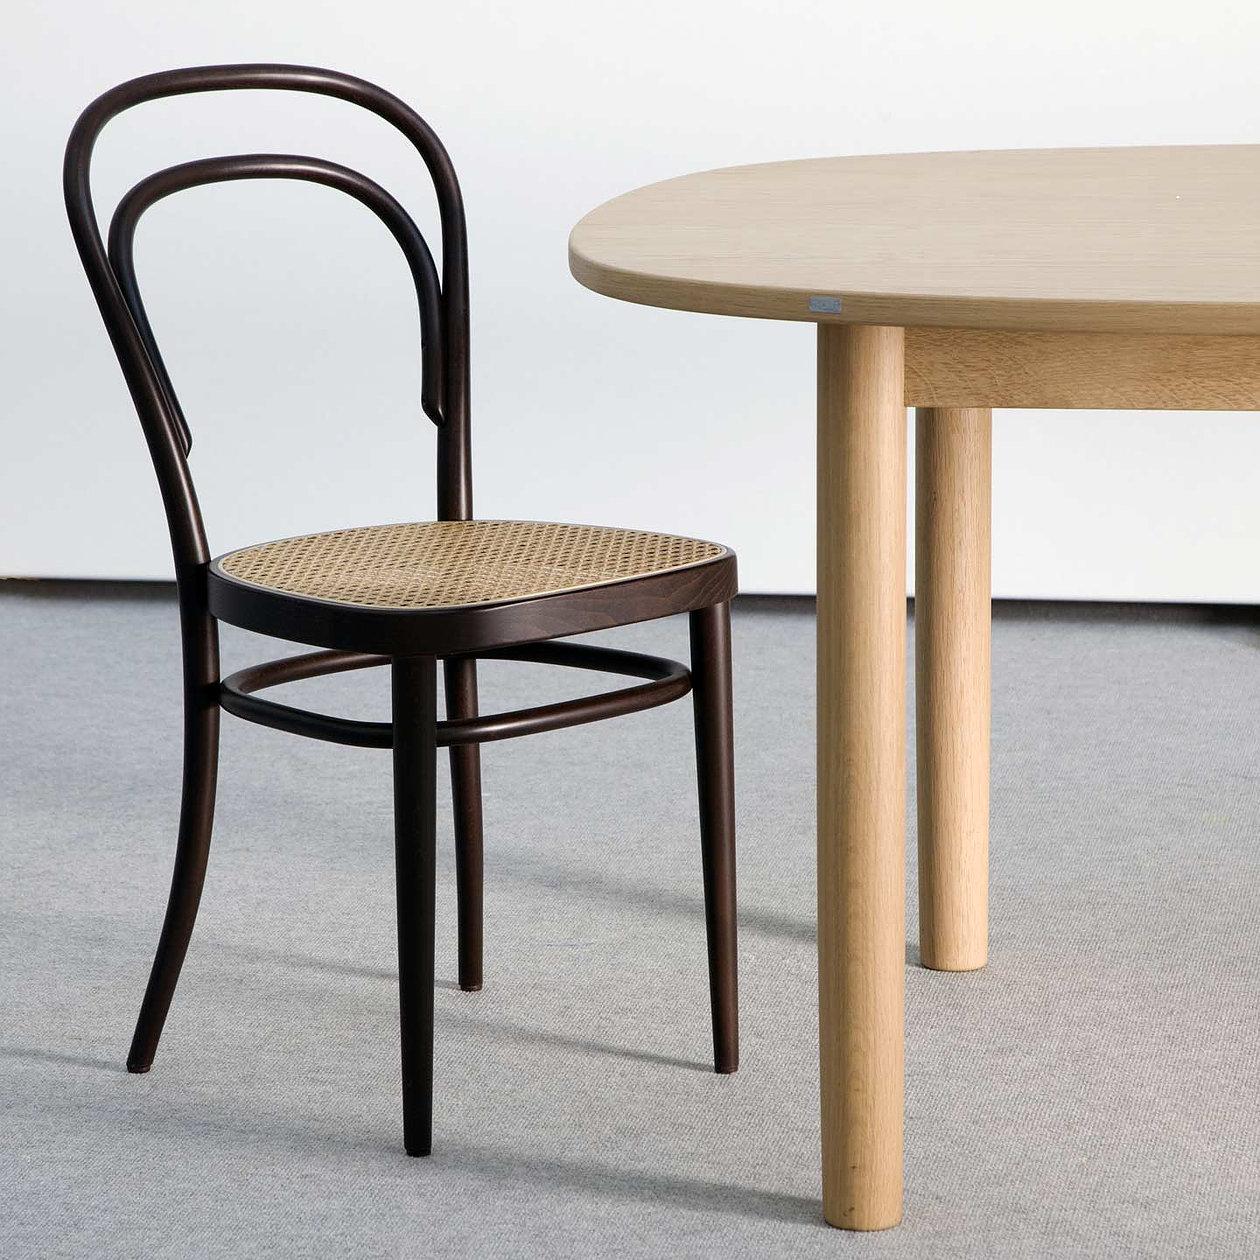 Michael Thonet, Thonet chair, od 200 EUR vir: www.aram.co.uk